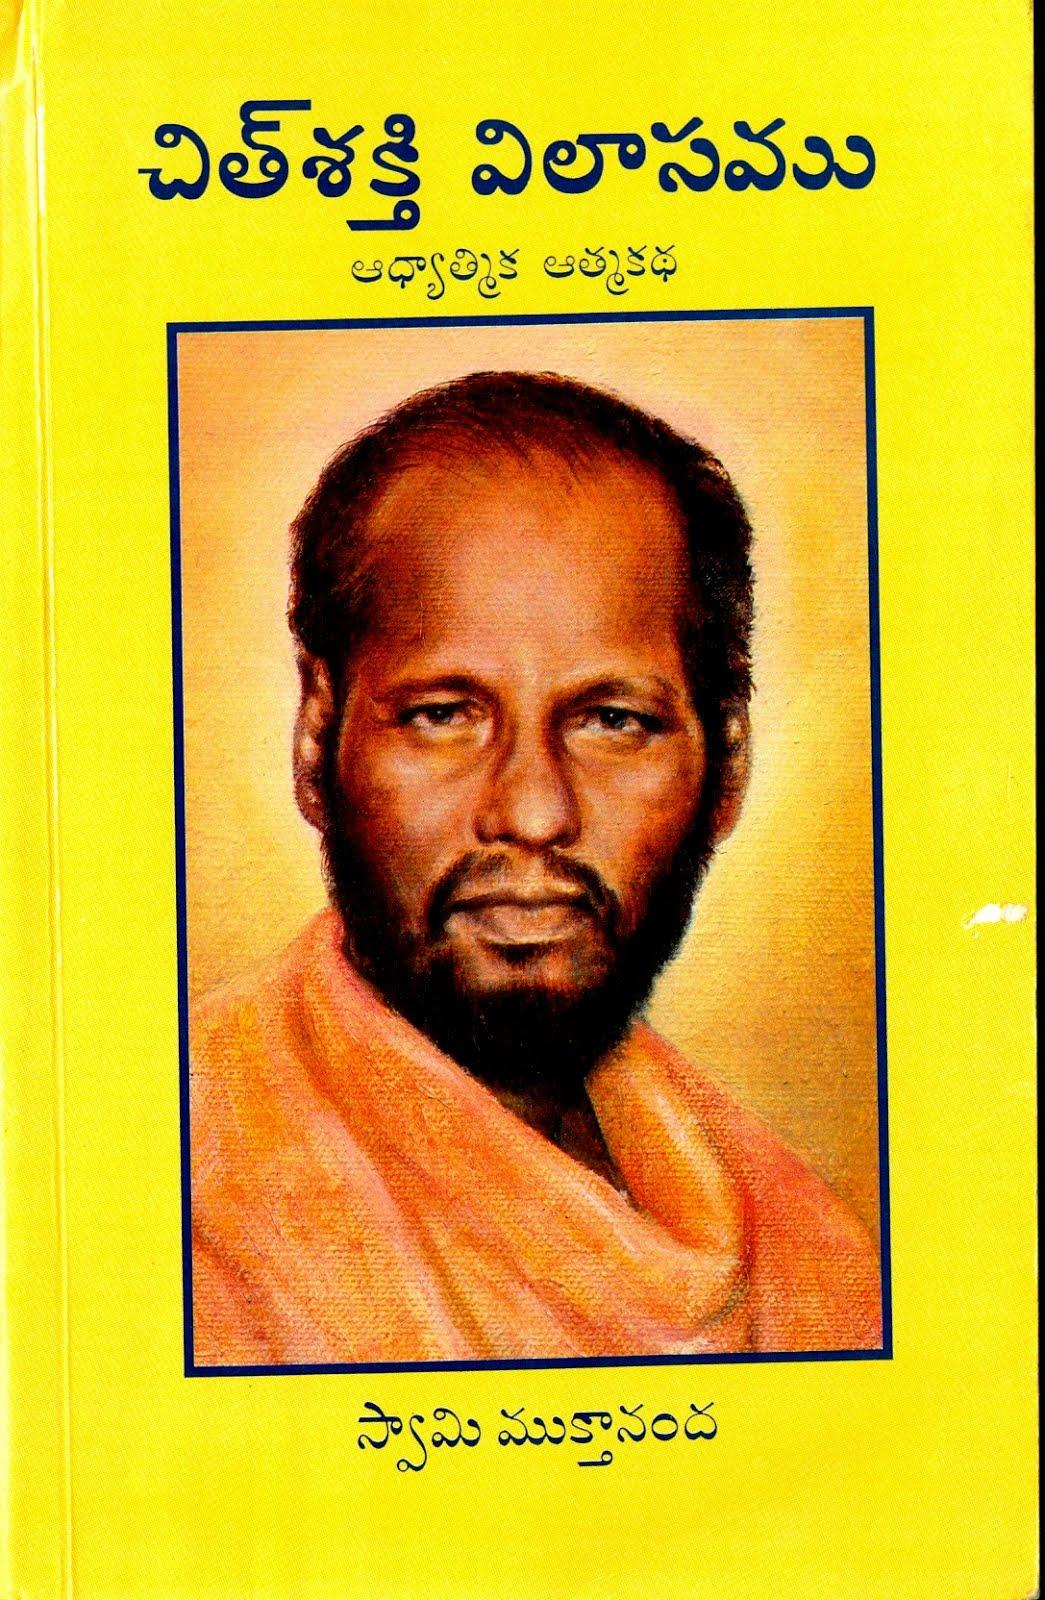 CHITH SHAKTHI VILASAMU